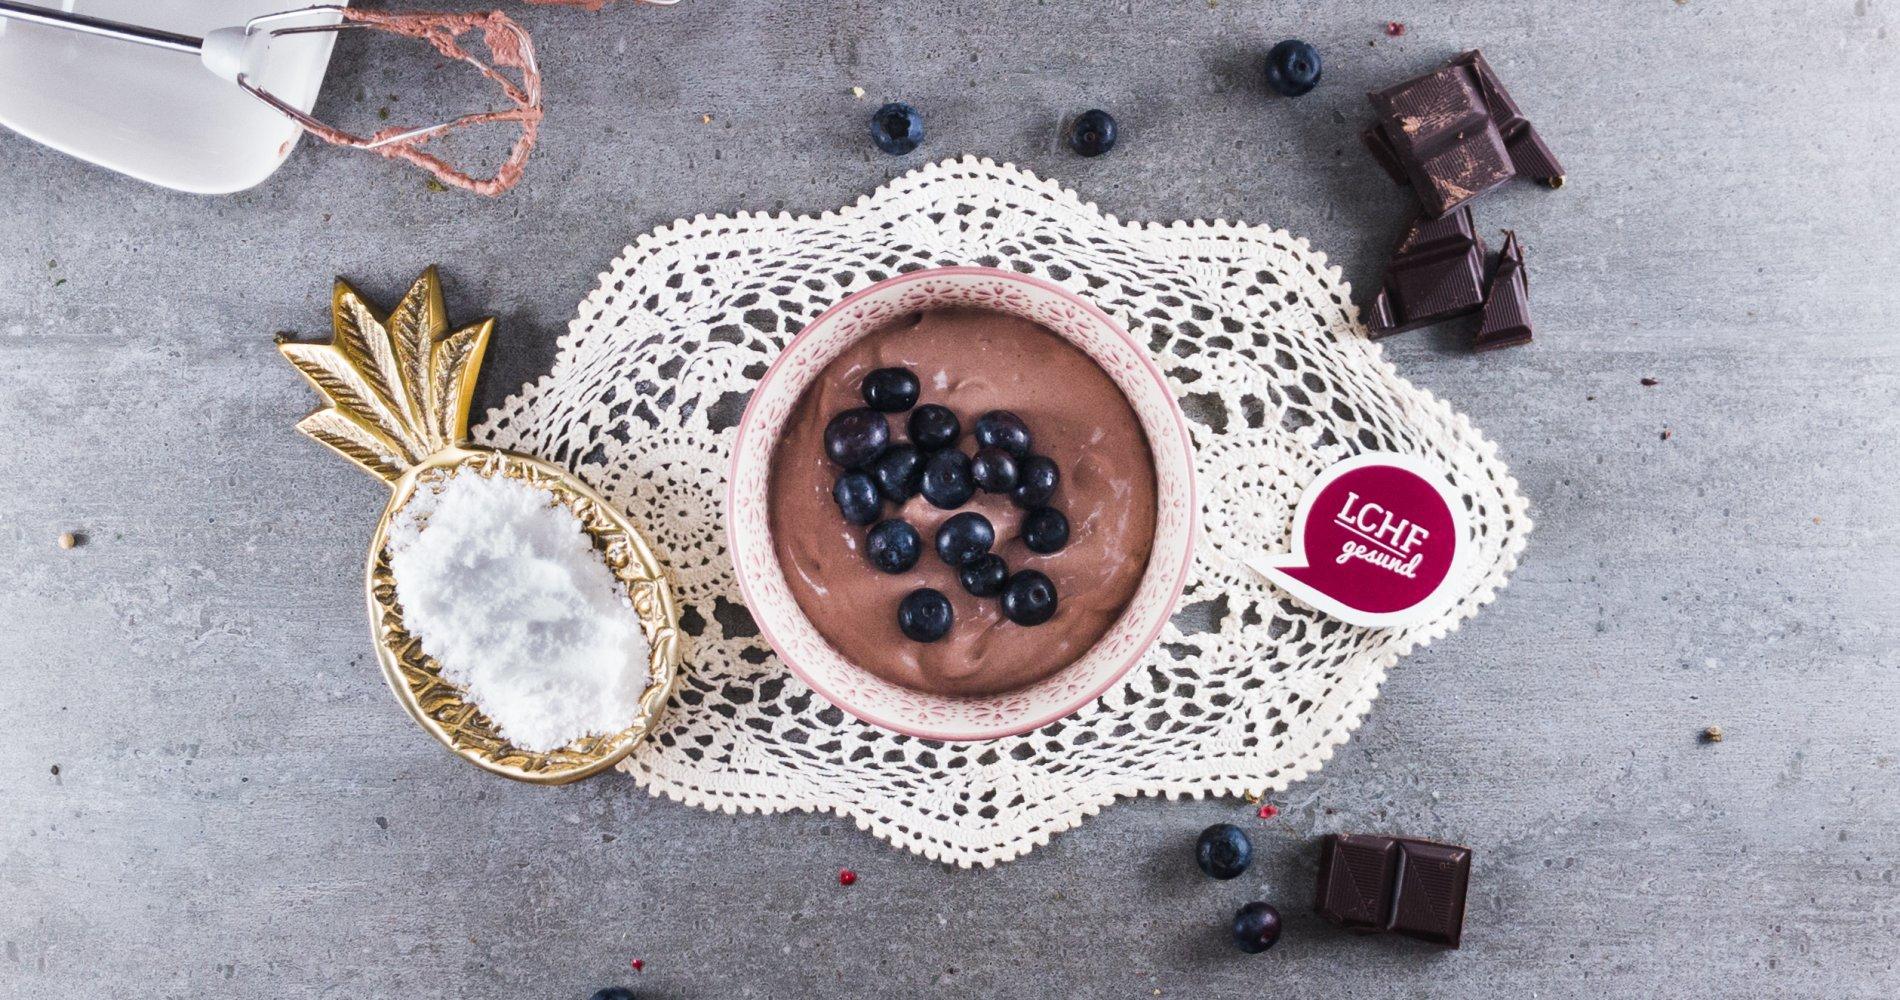 Rezept Low Carb: Schokoladige Kakao-Creme - LCHF-gesund.de